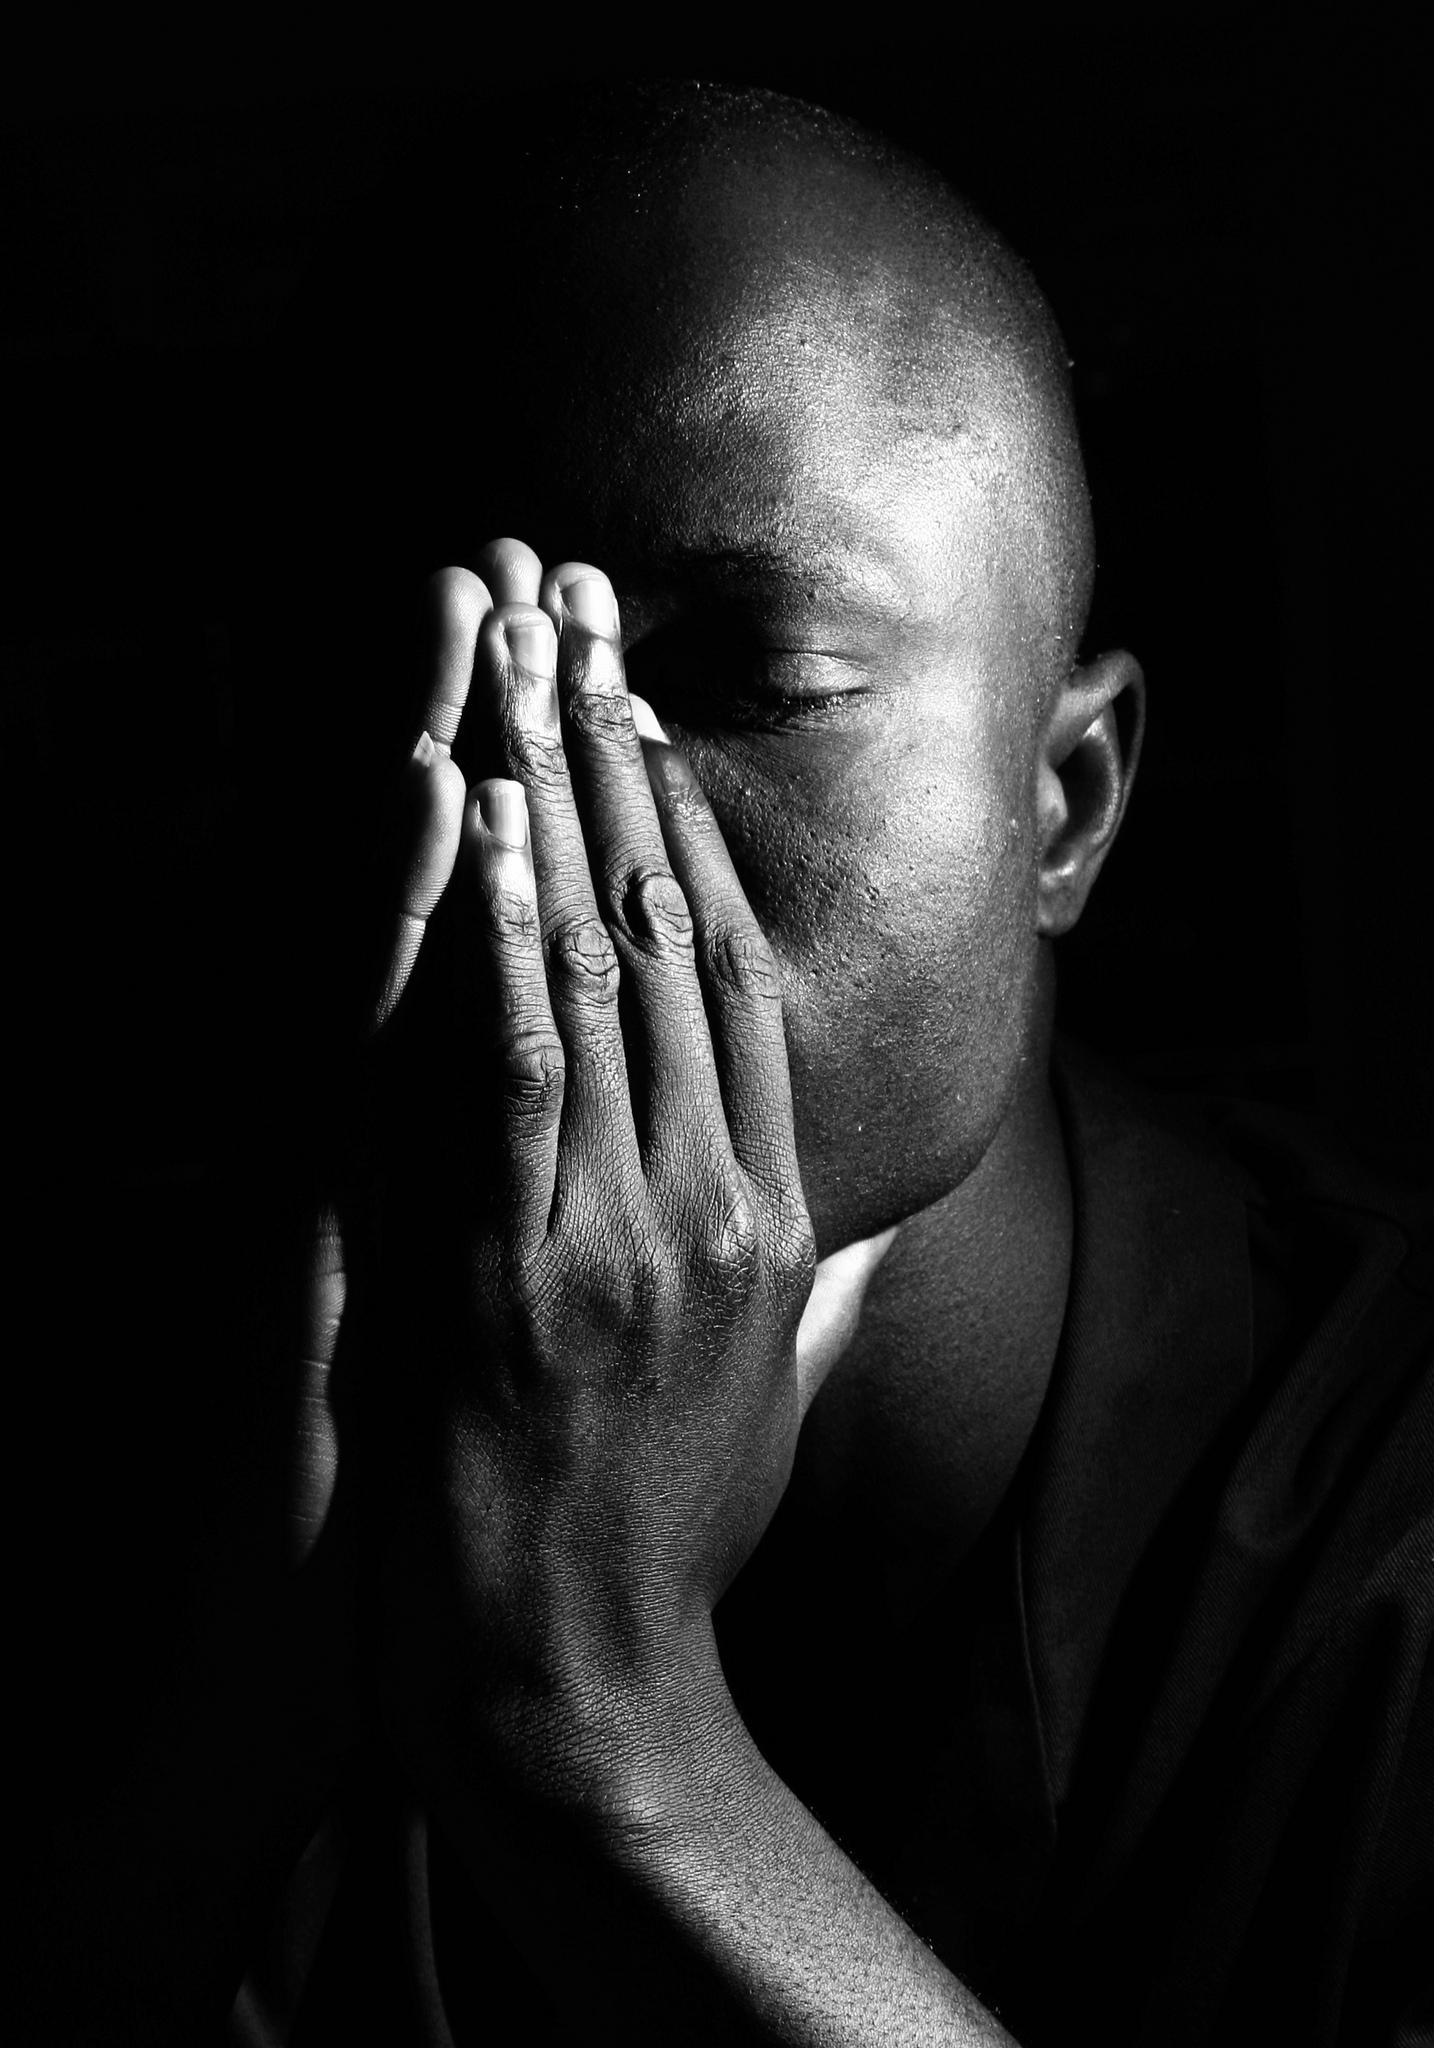 9.2 Praying Man – Petras Gagilas, Flickr